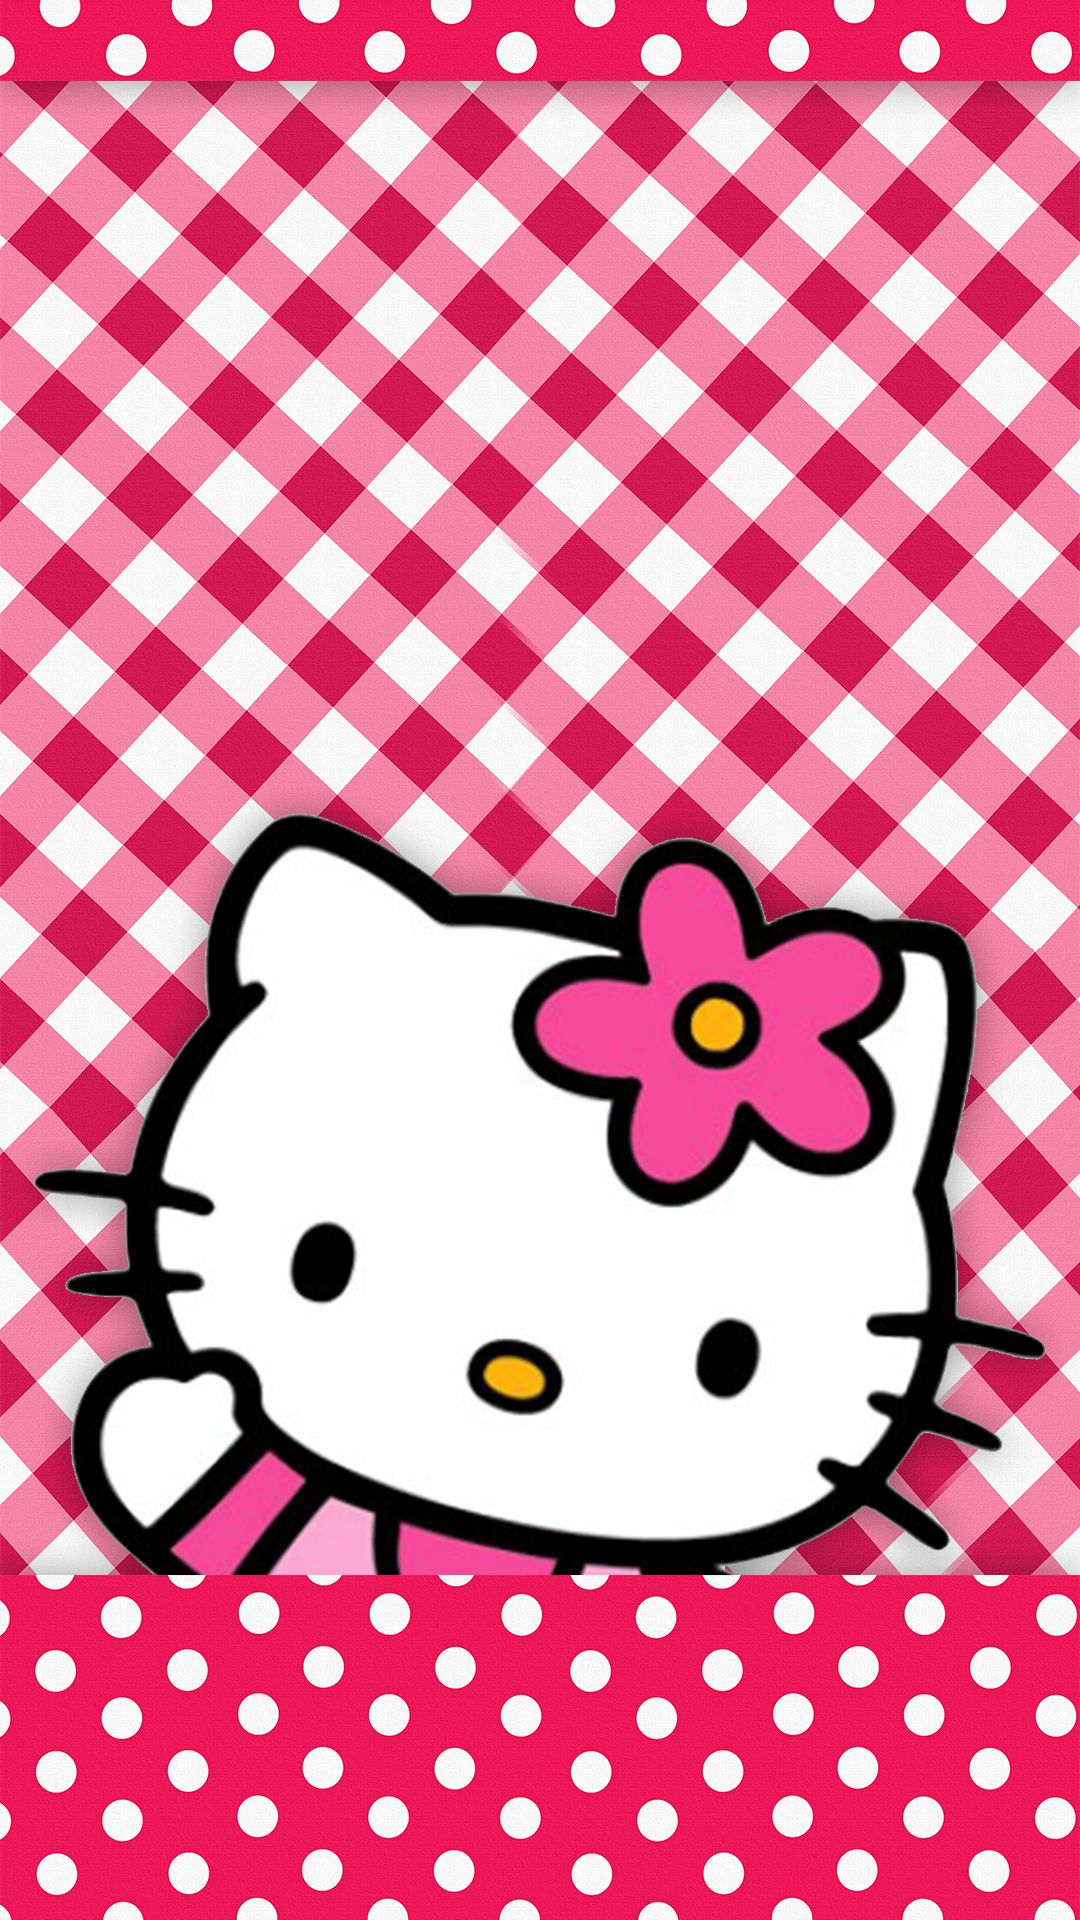 Amazing Wallpaper Hello Kitty Coffee - cfc97d1891b9be543f511d16686c45c5  Image_20440.jpg